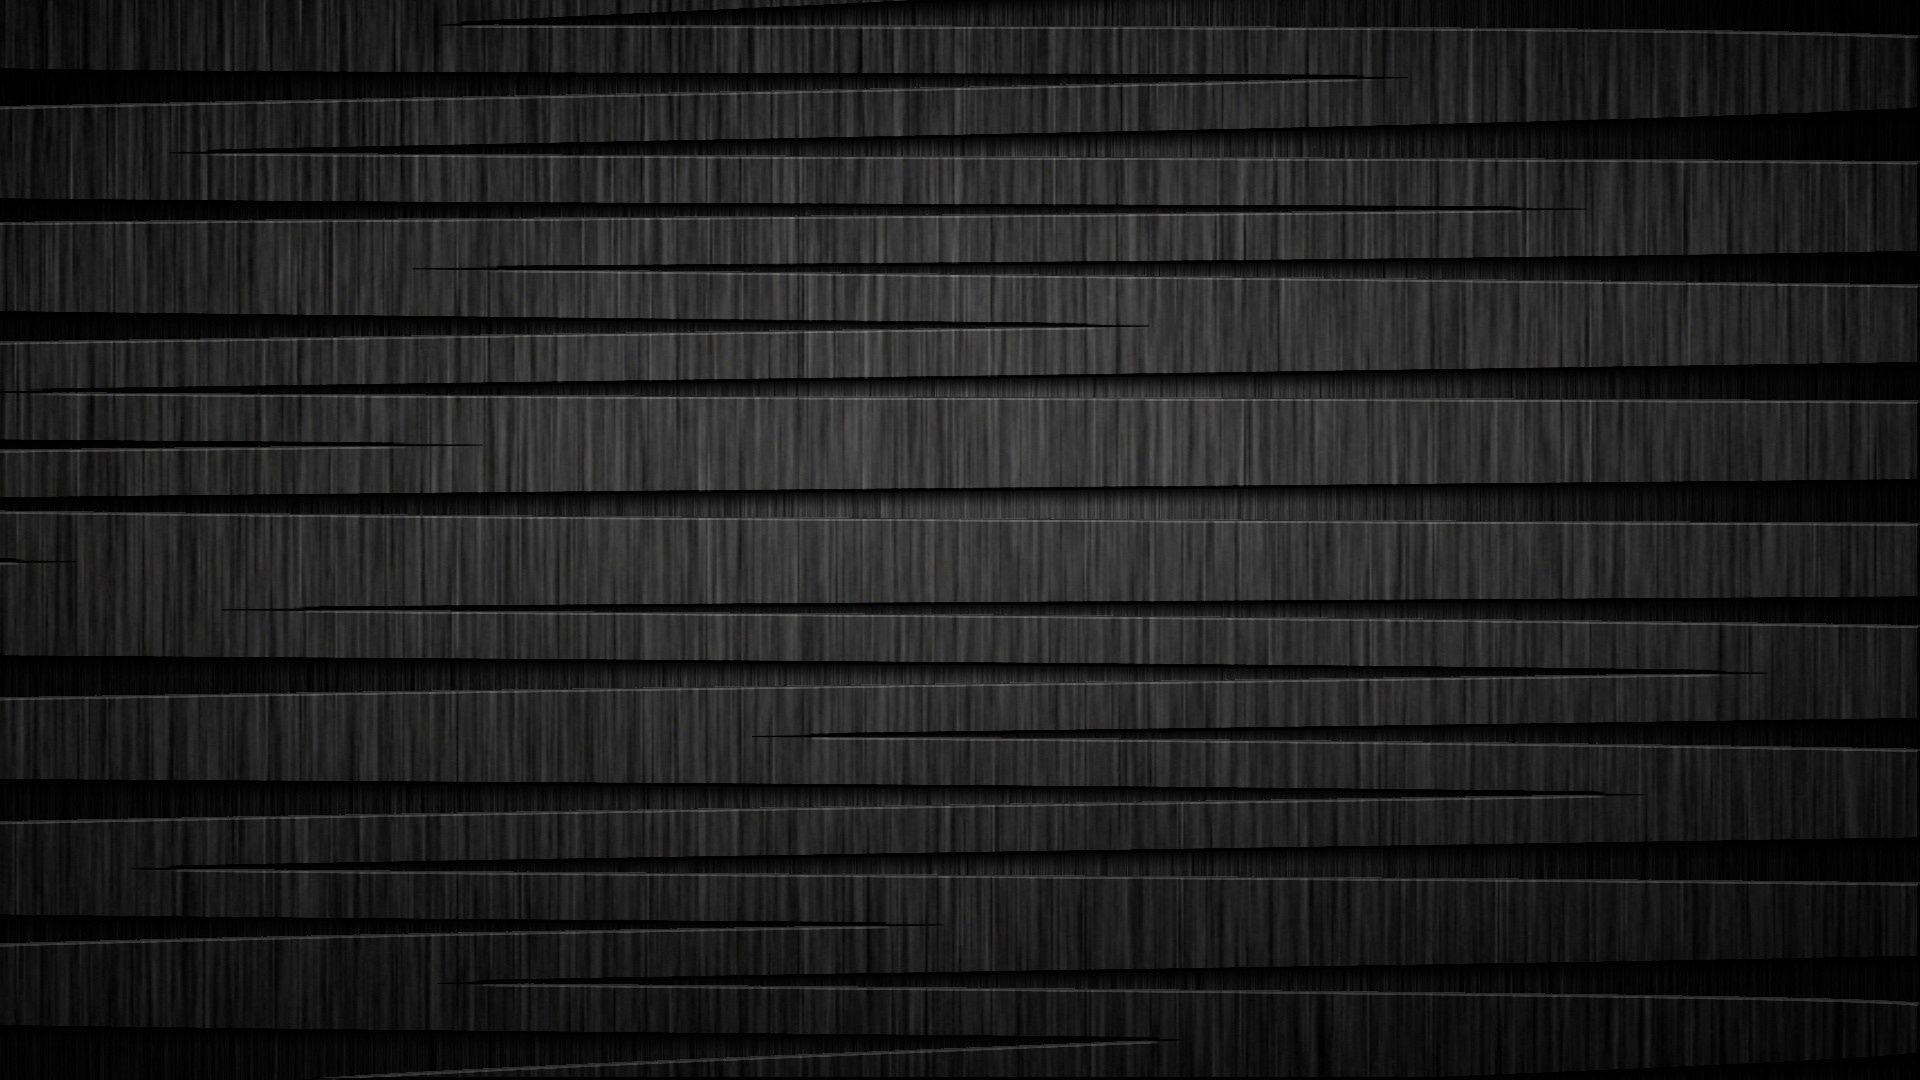 Download Wallpaper 1920x1080 Lines Dark Uneven Background Full Hd 1080p Hd Background Papier Peint Texture Fond D Ecran Abstrait Fond Ecran Tumblr